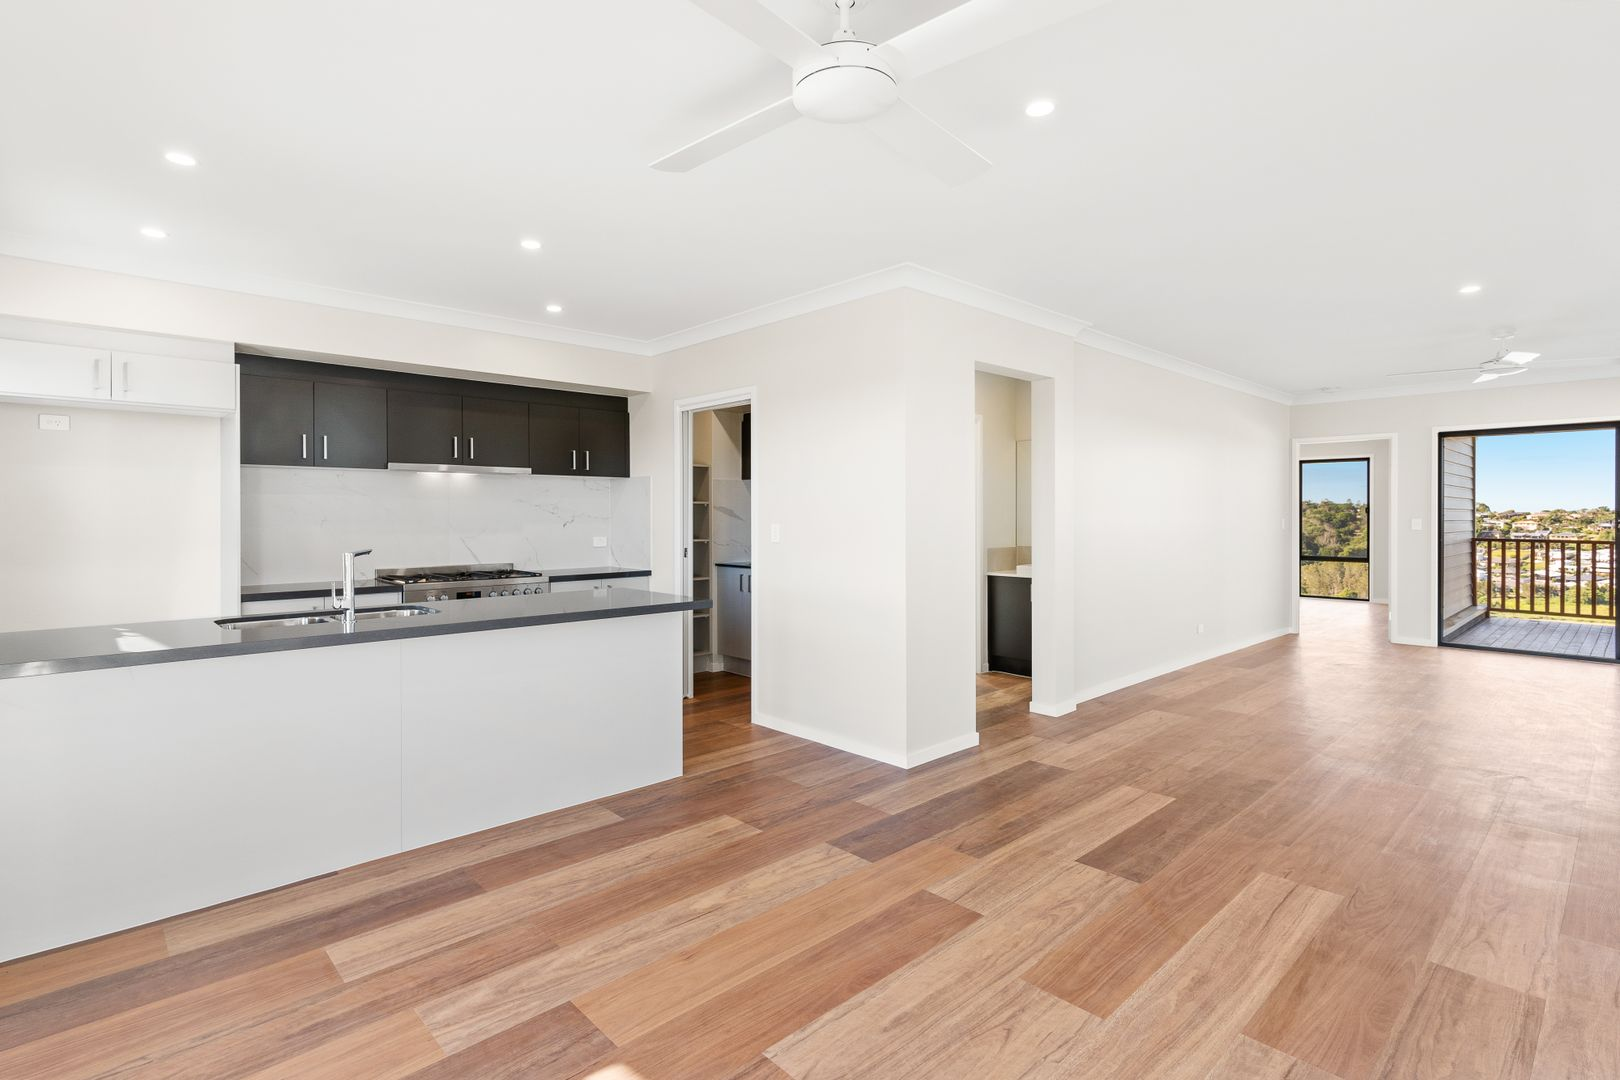 59A Stoneyhurst Drive, Lennox Head NSW 2478, Image 0